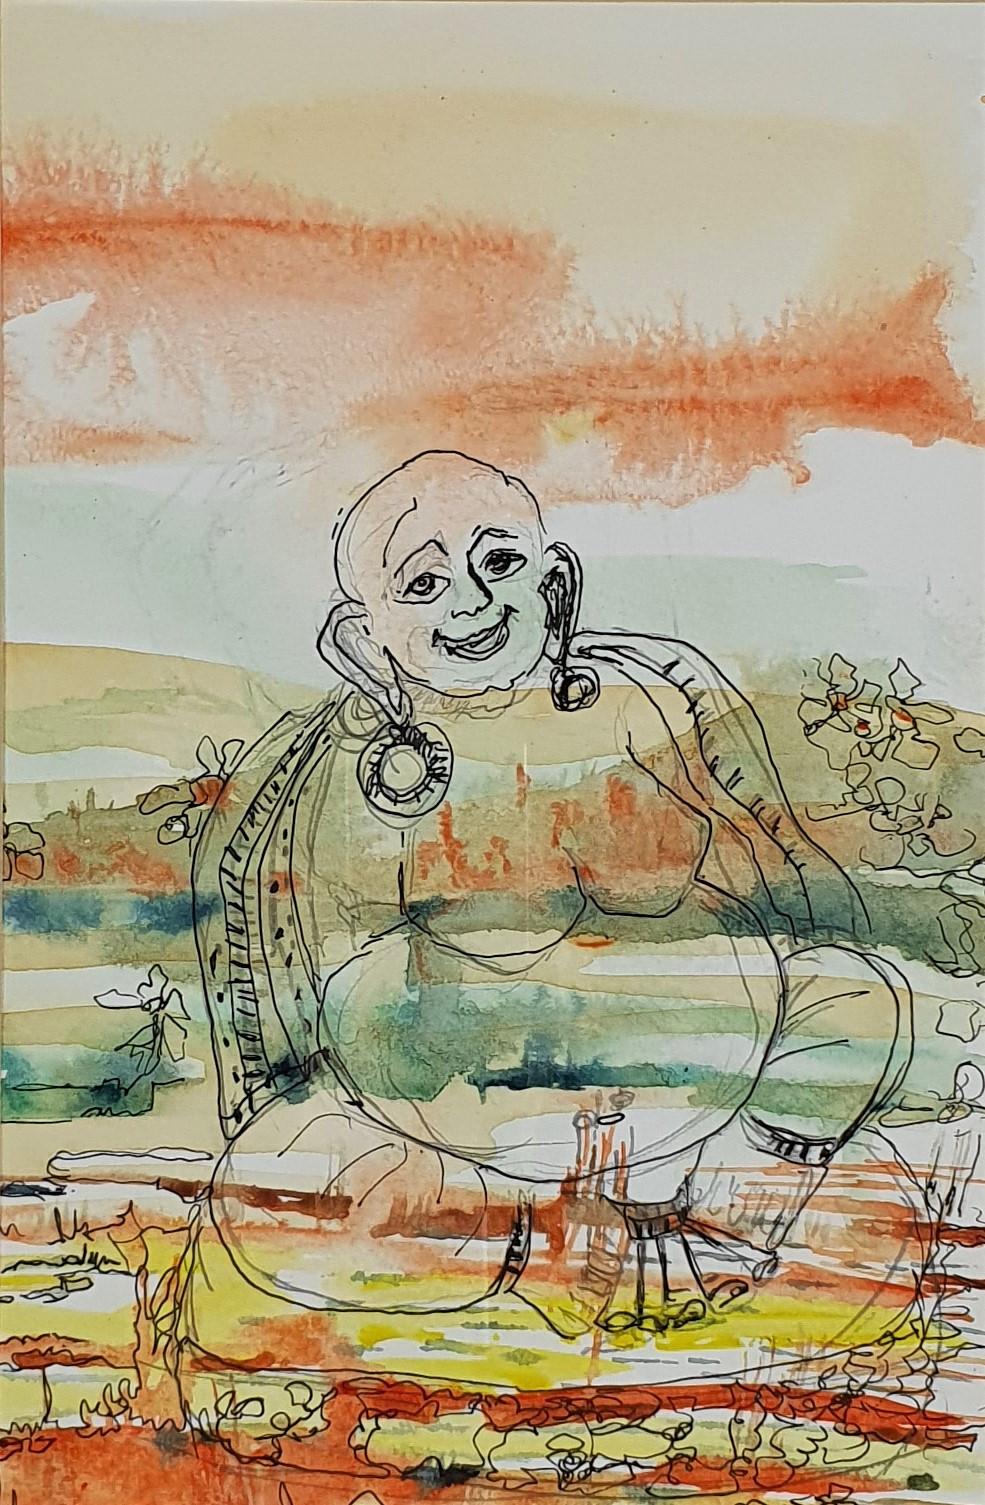 46. Laughing Buddha